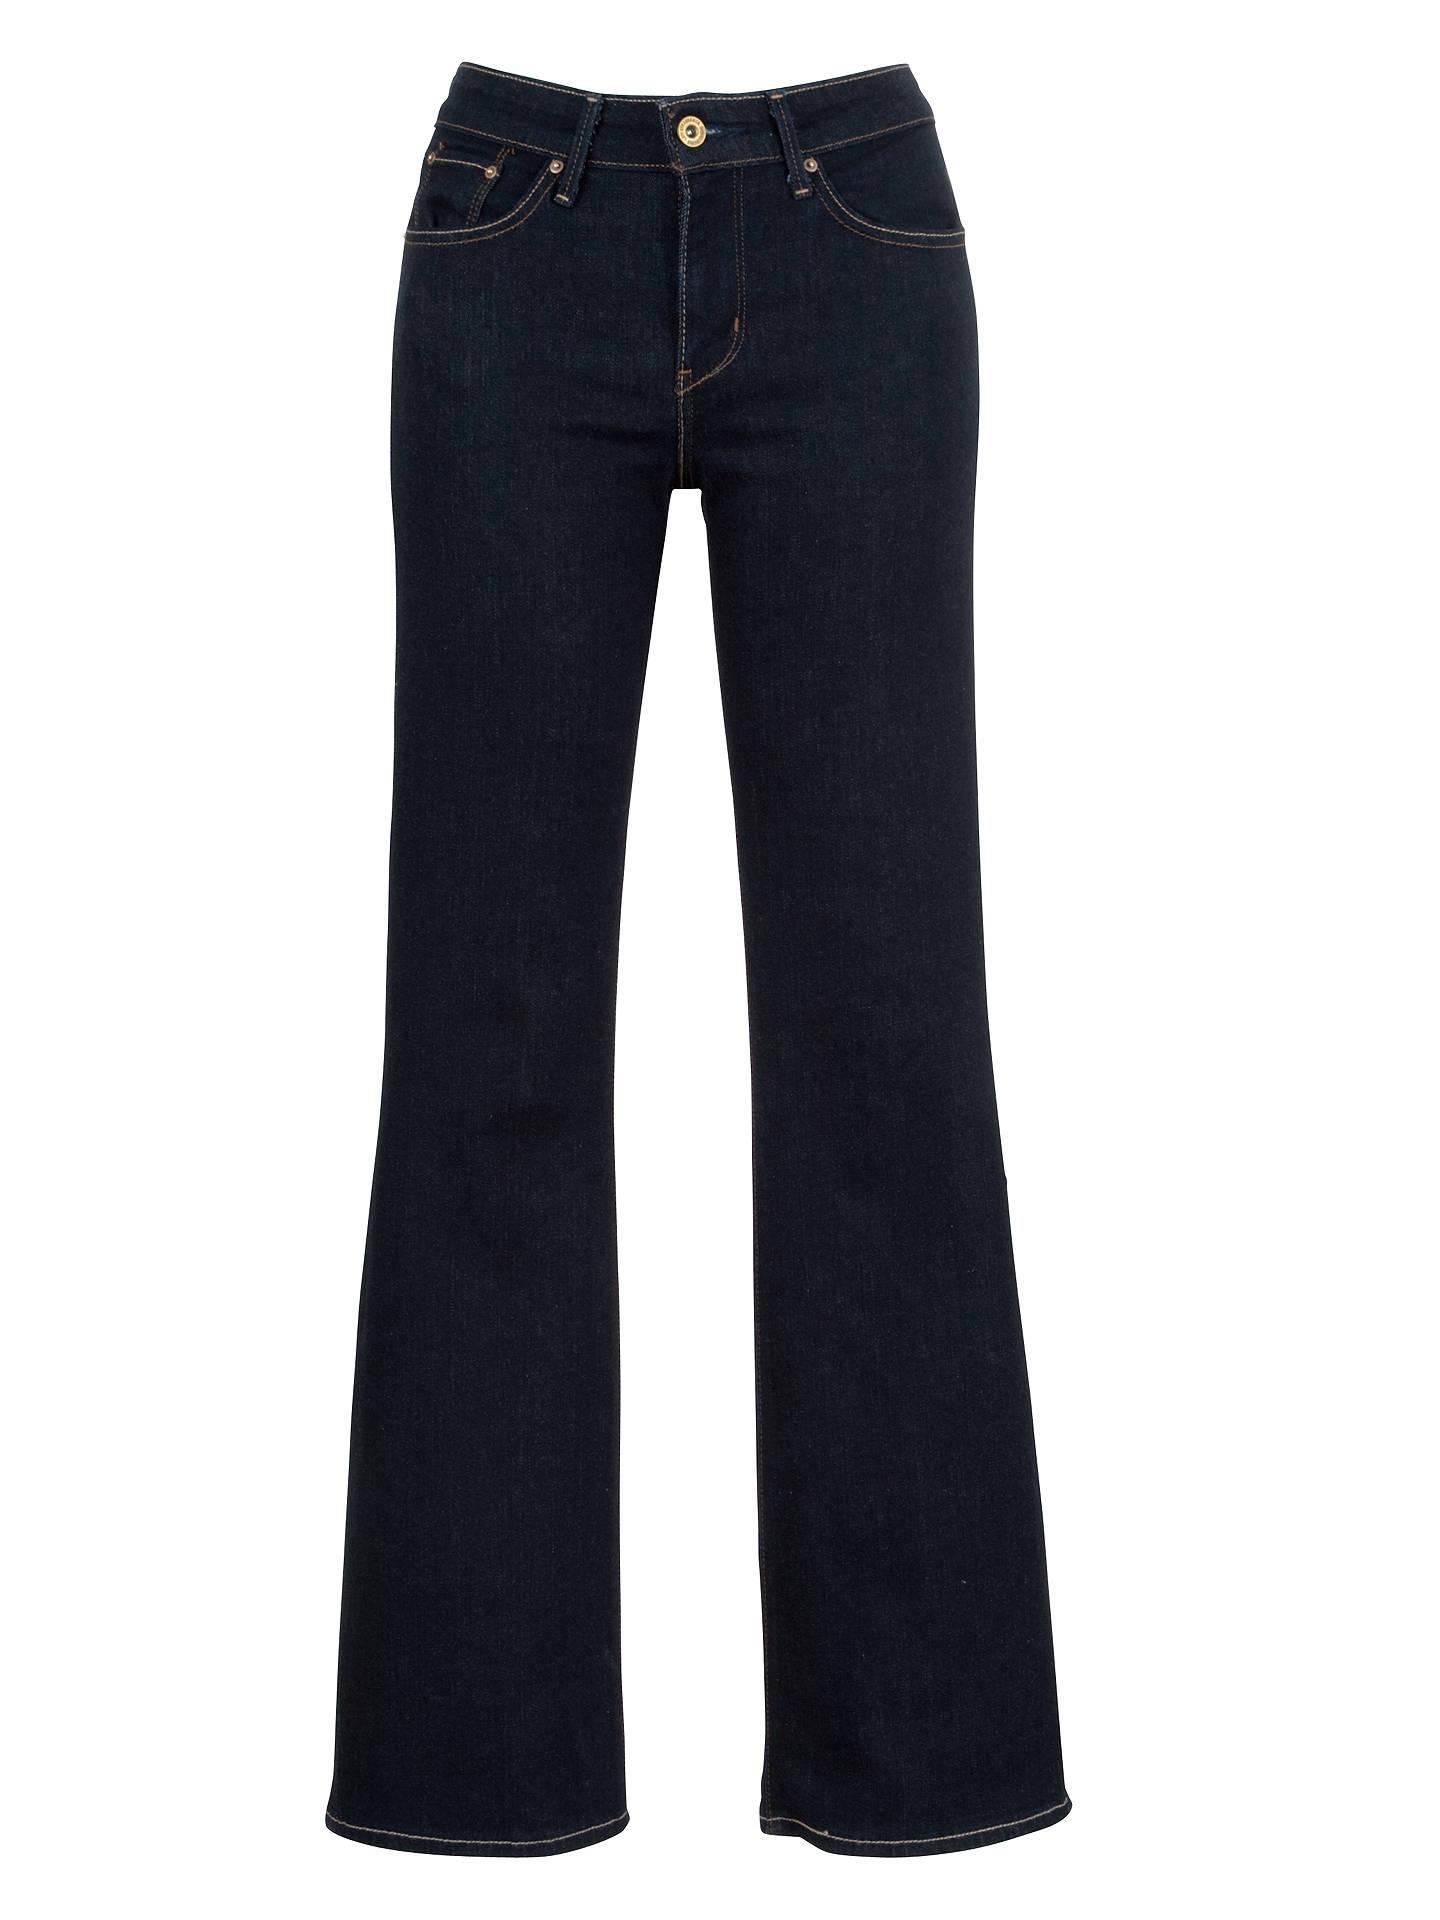 Levi's Curve ID Demi Curve Bootcut Jeans, Indigo at John